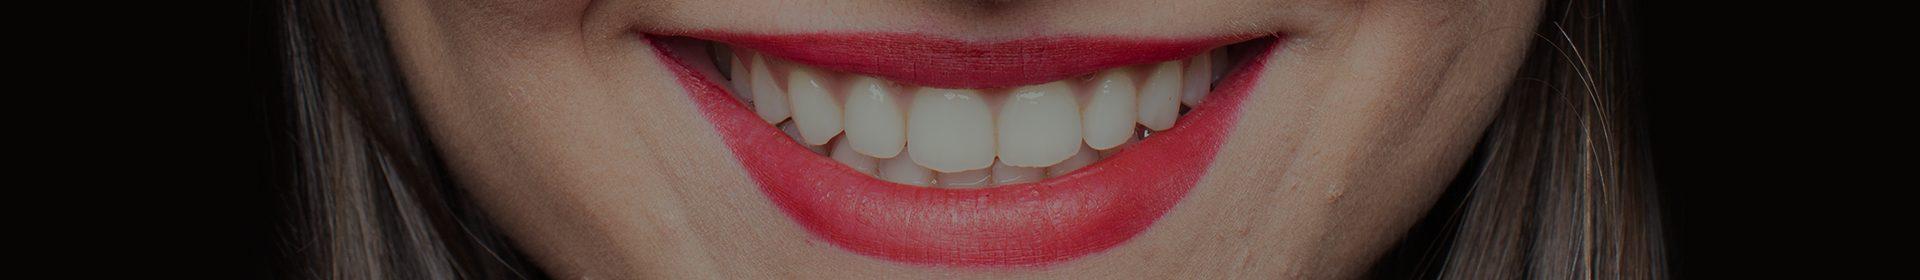 Dental Bonding in Richmond, VT